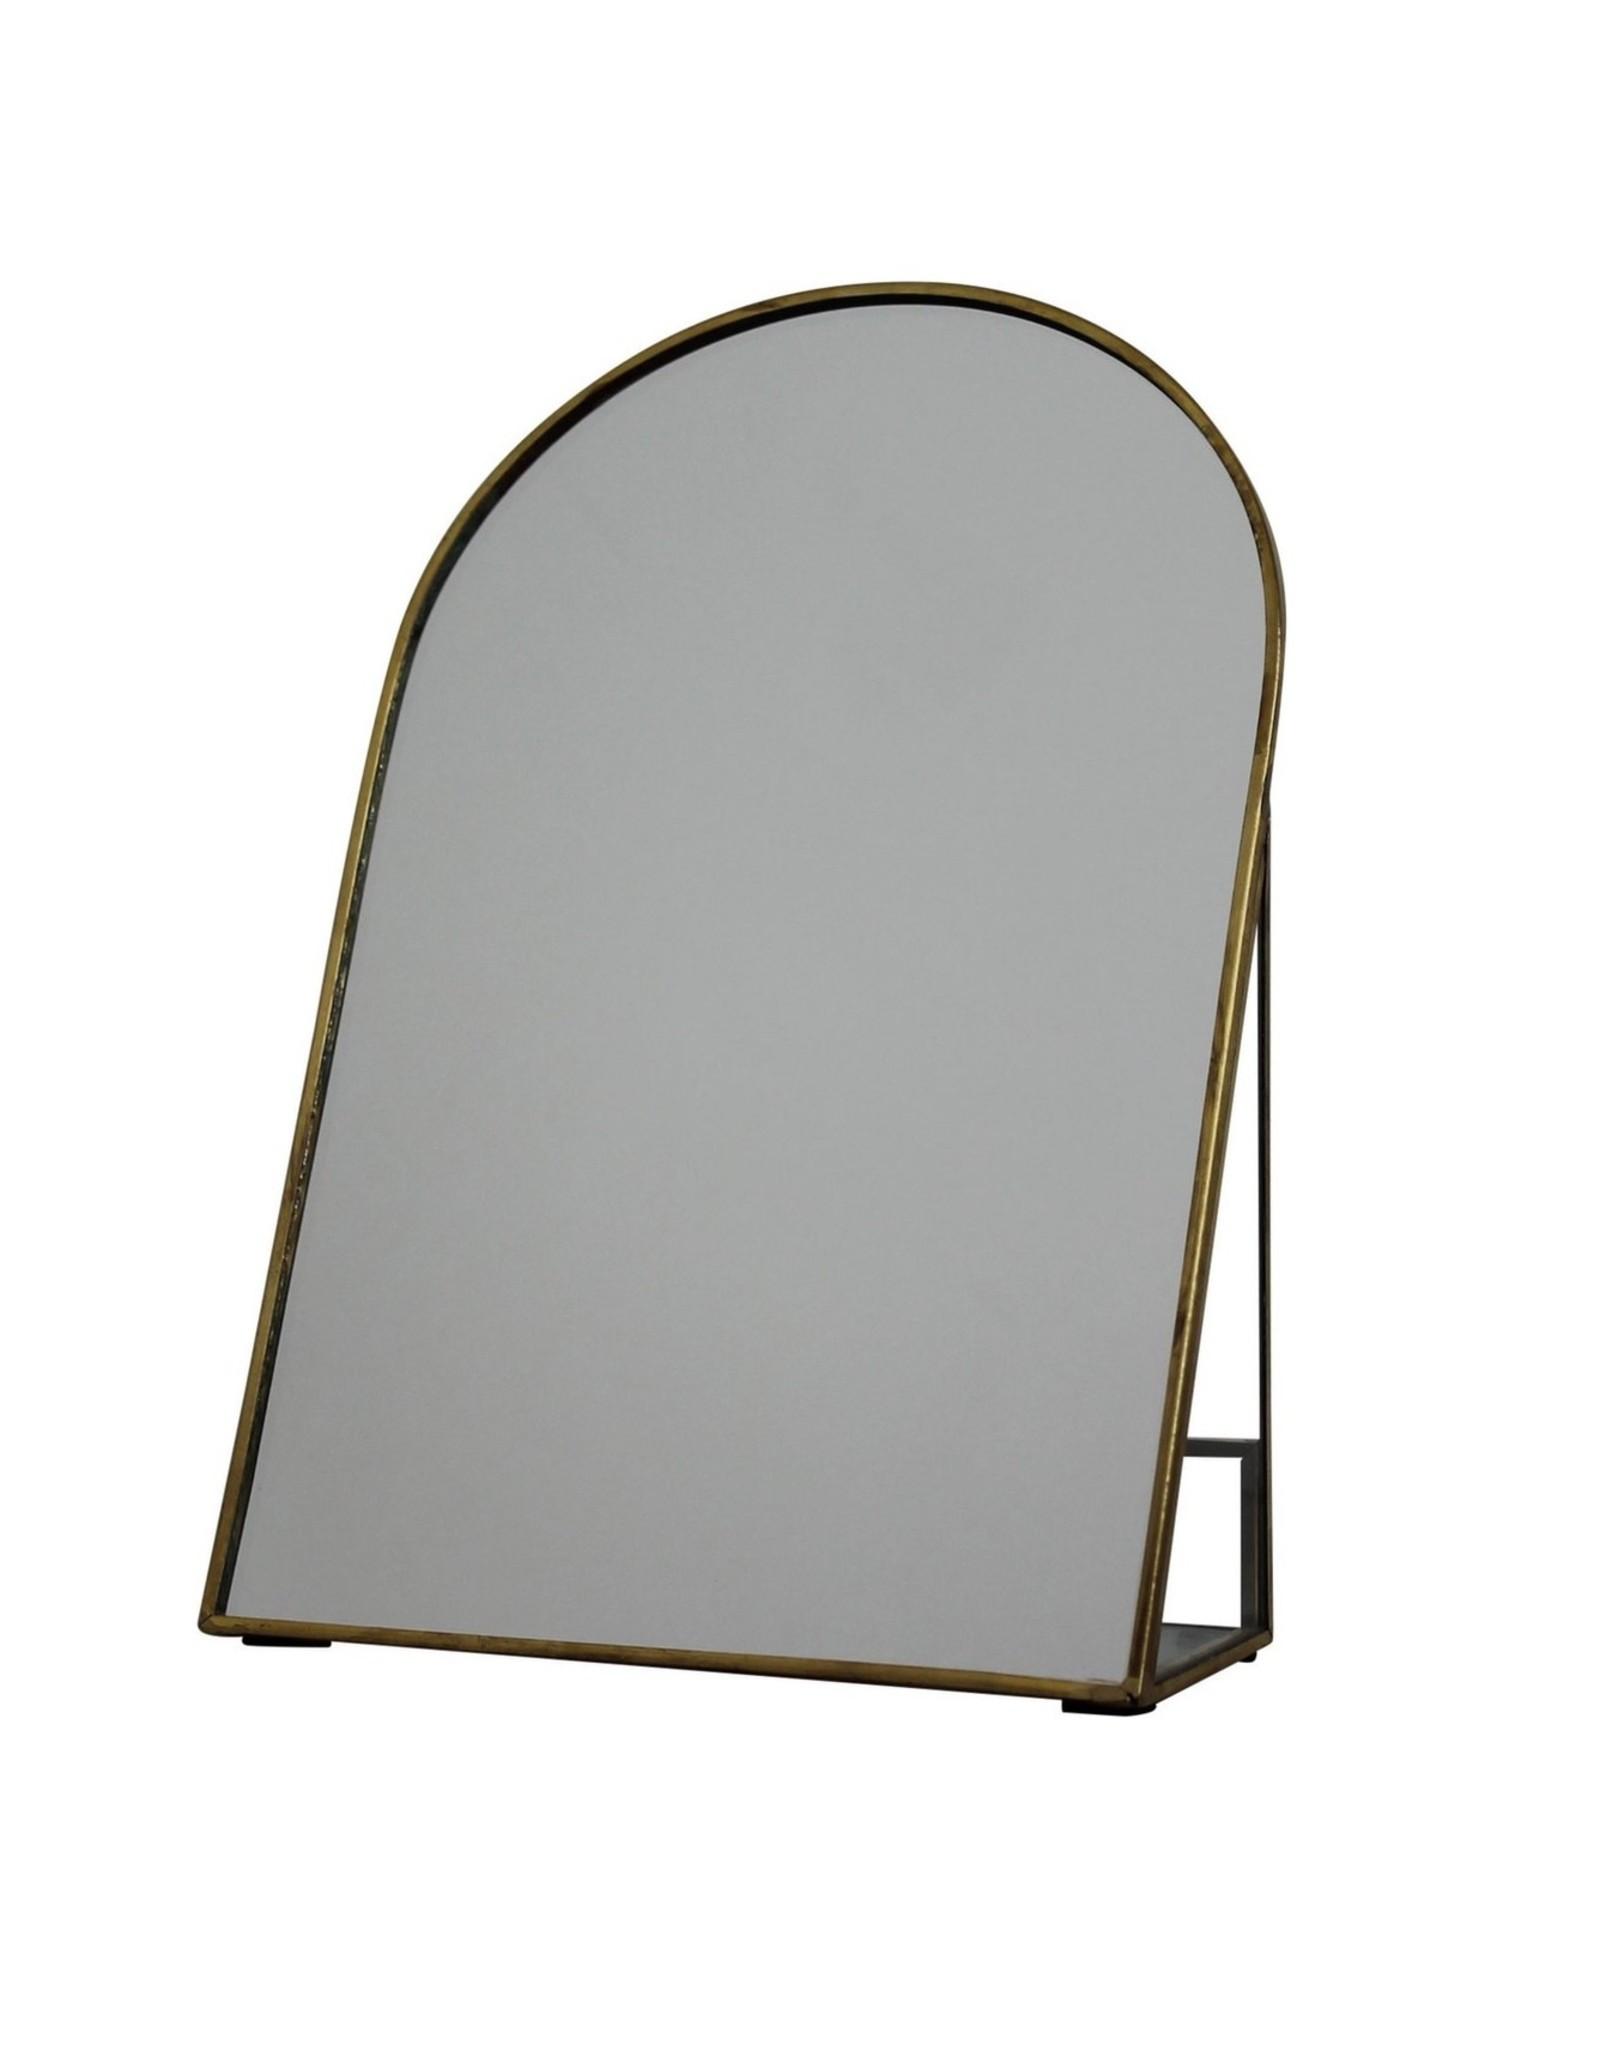 Parya Home Parya Home - Staande spiegel - Goud - 23x16 cm